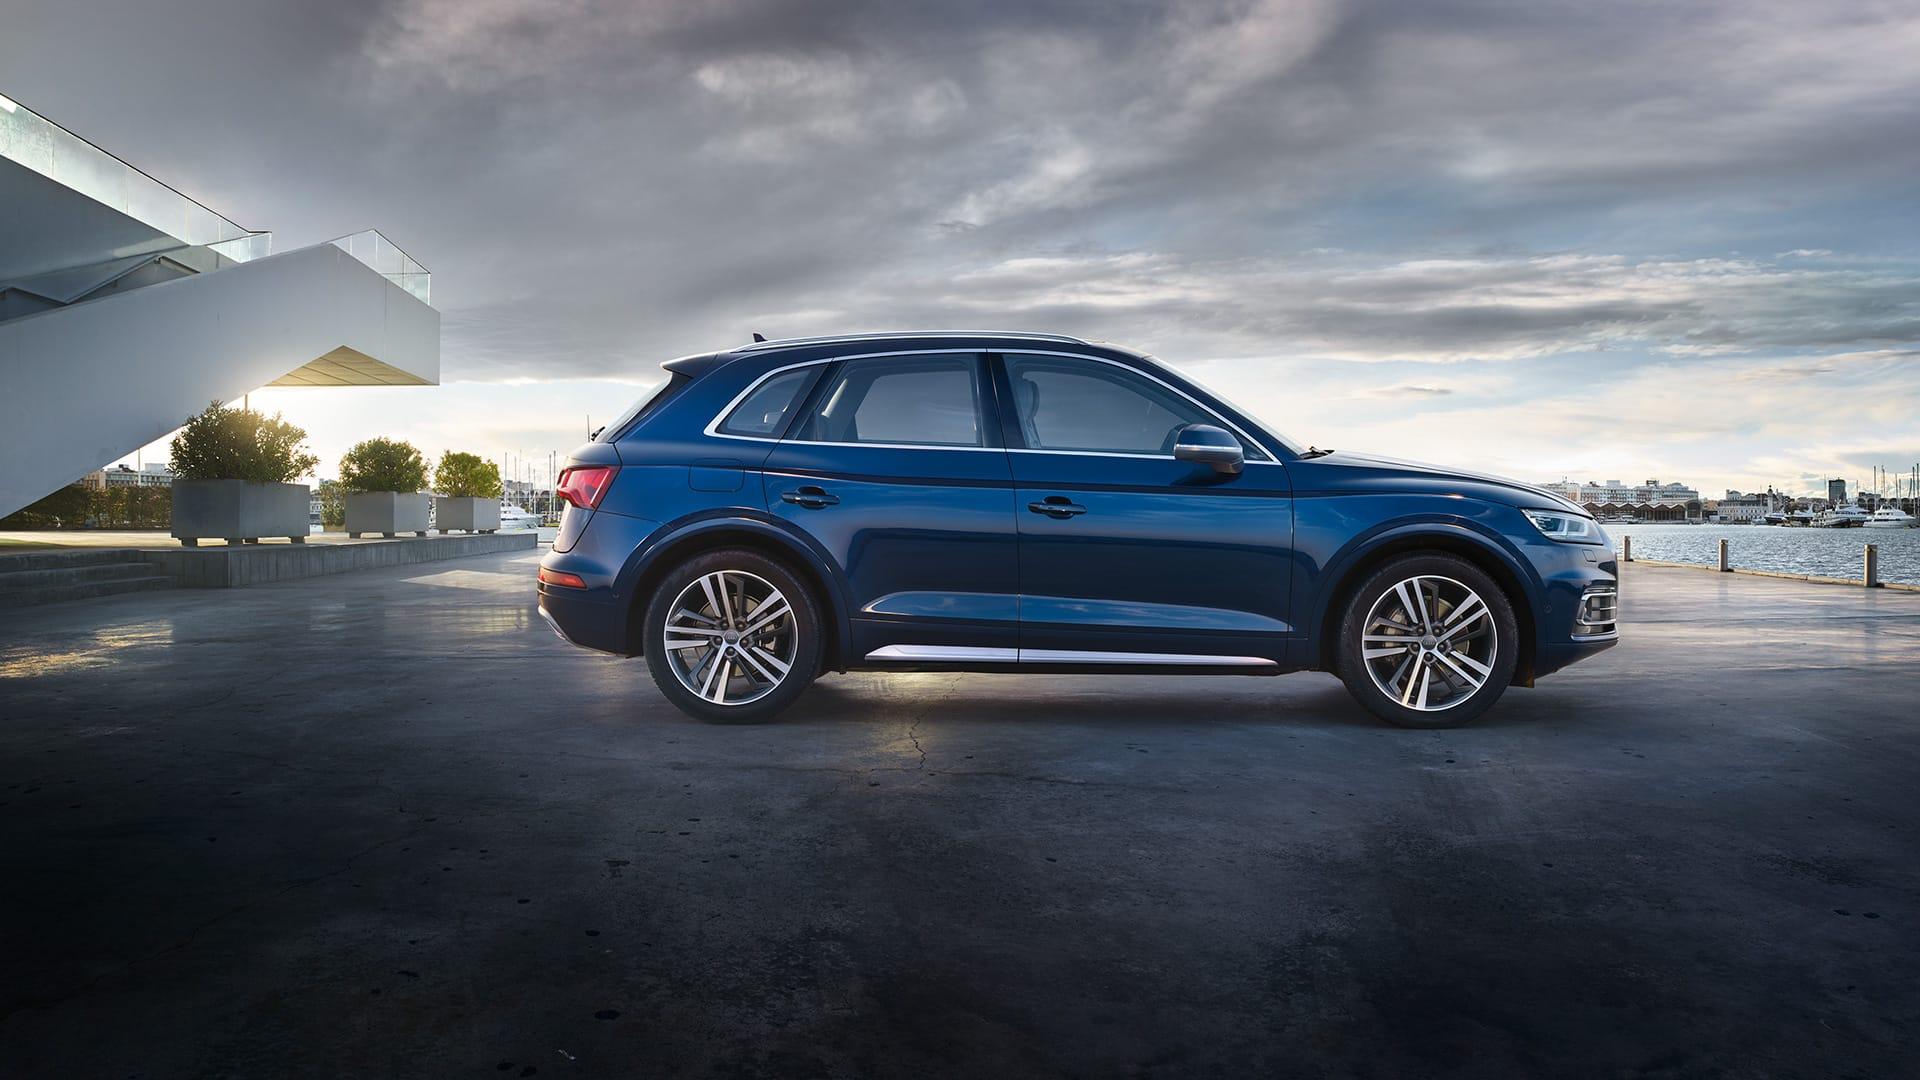 Audi Q5 Luxury Crossover SUV